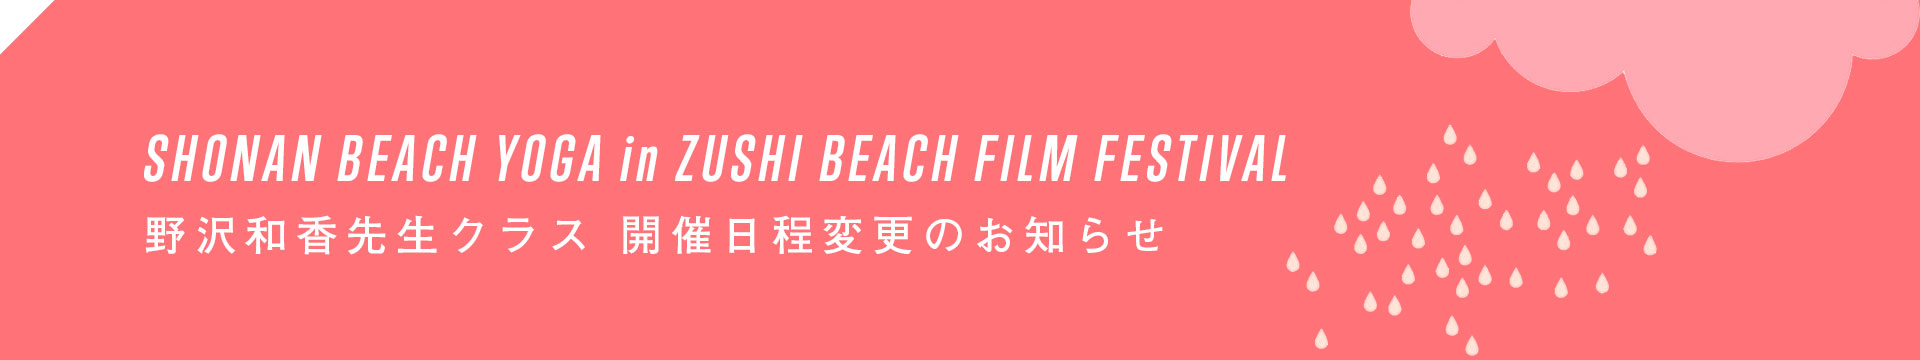 201904_zushifilm_event_banner.jpg